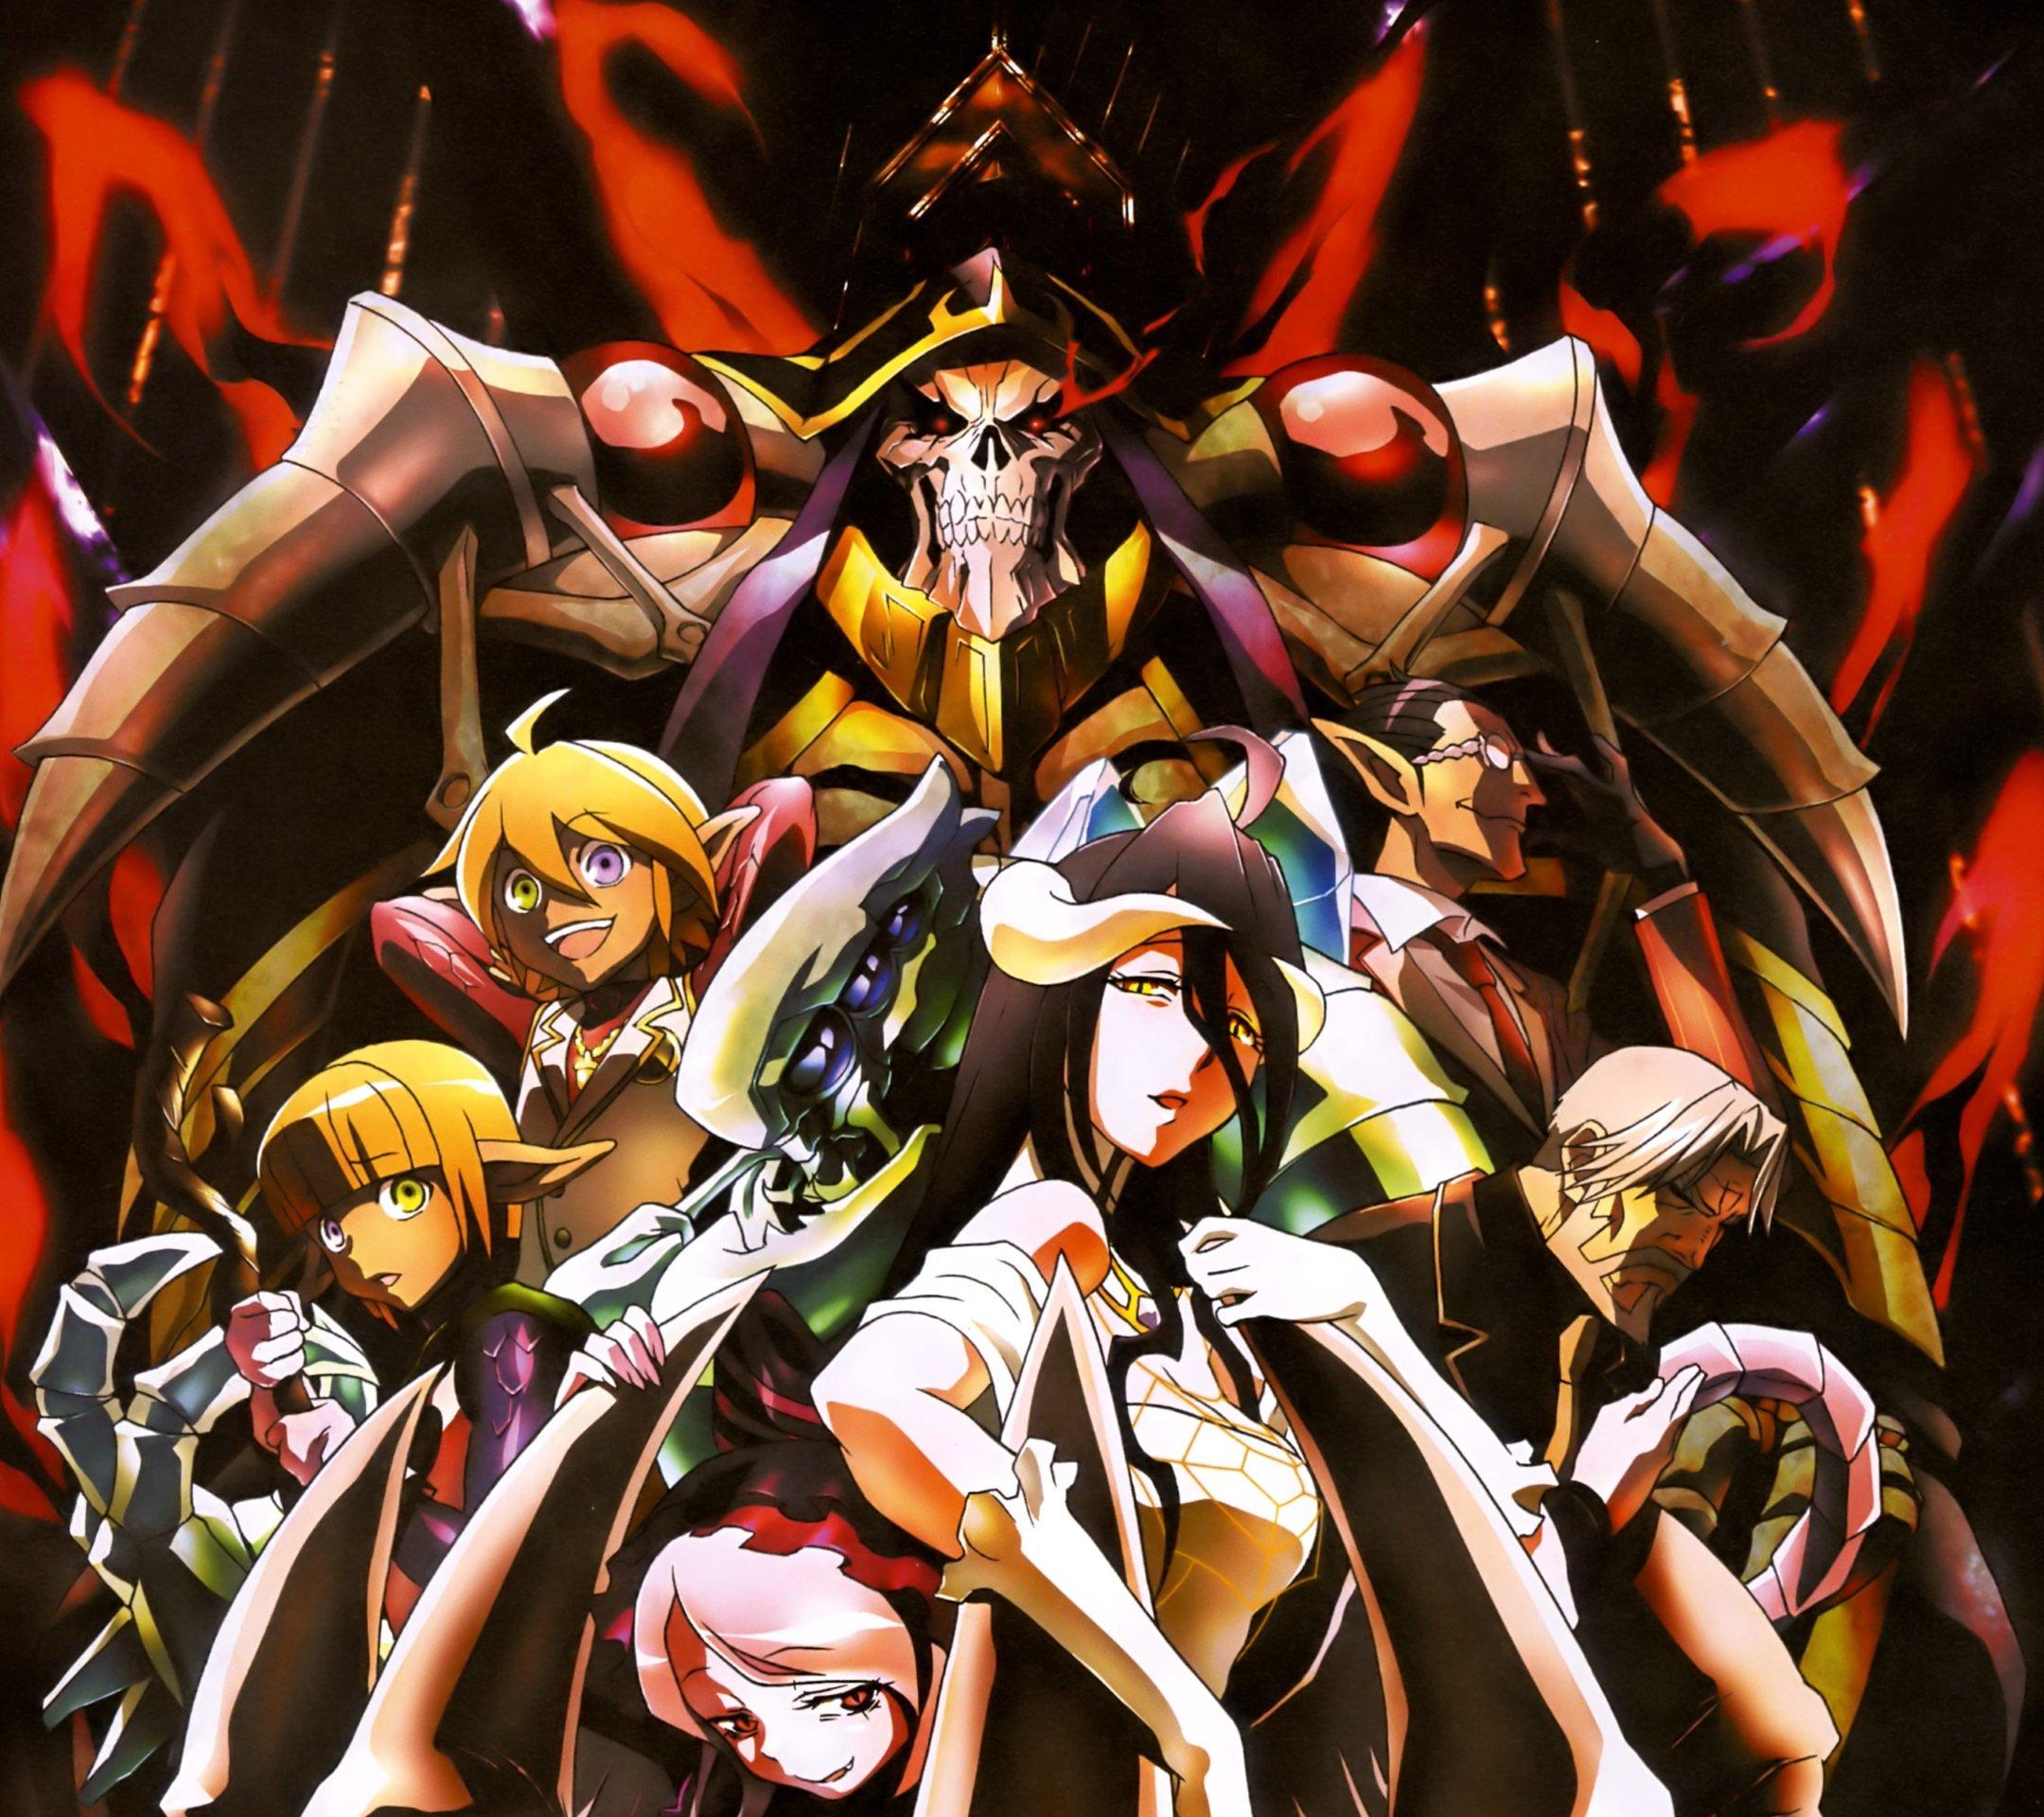 Overlord anime albedo wallpaper wallpapersafari - Anime wallpaper for smartphone ...